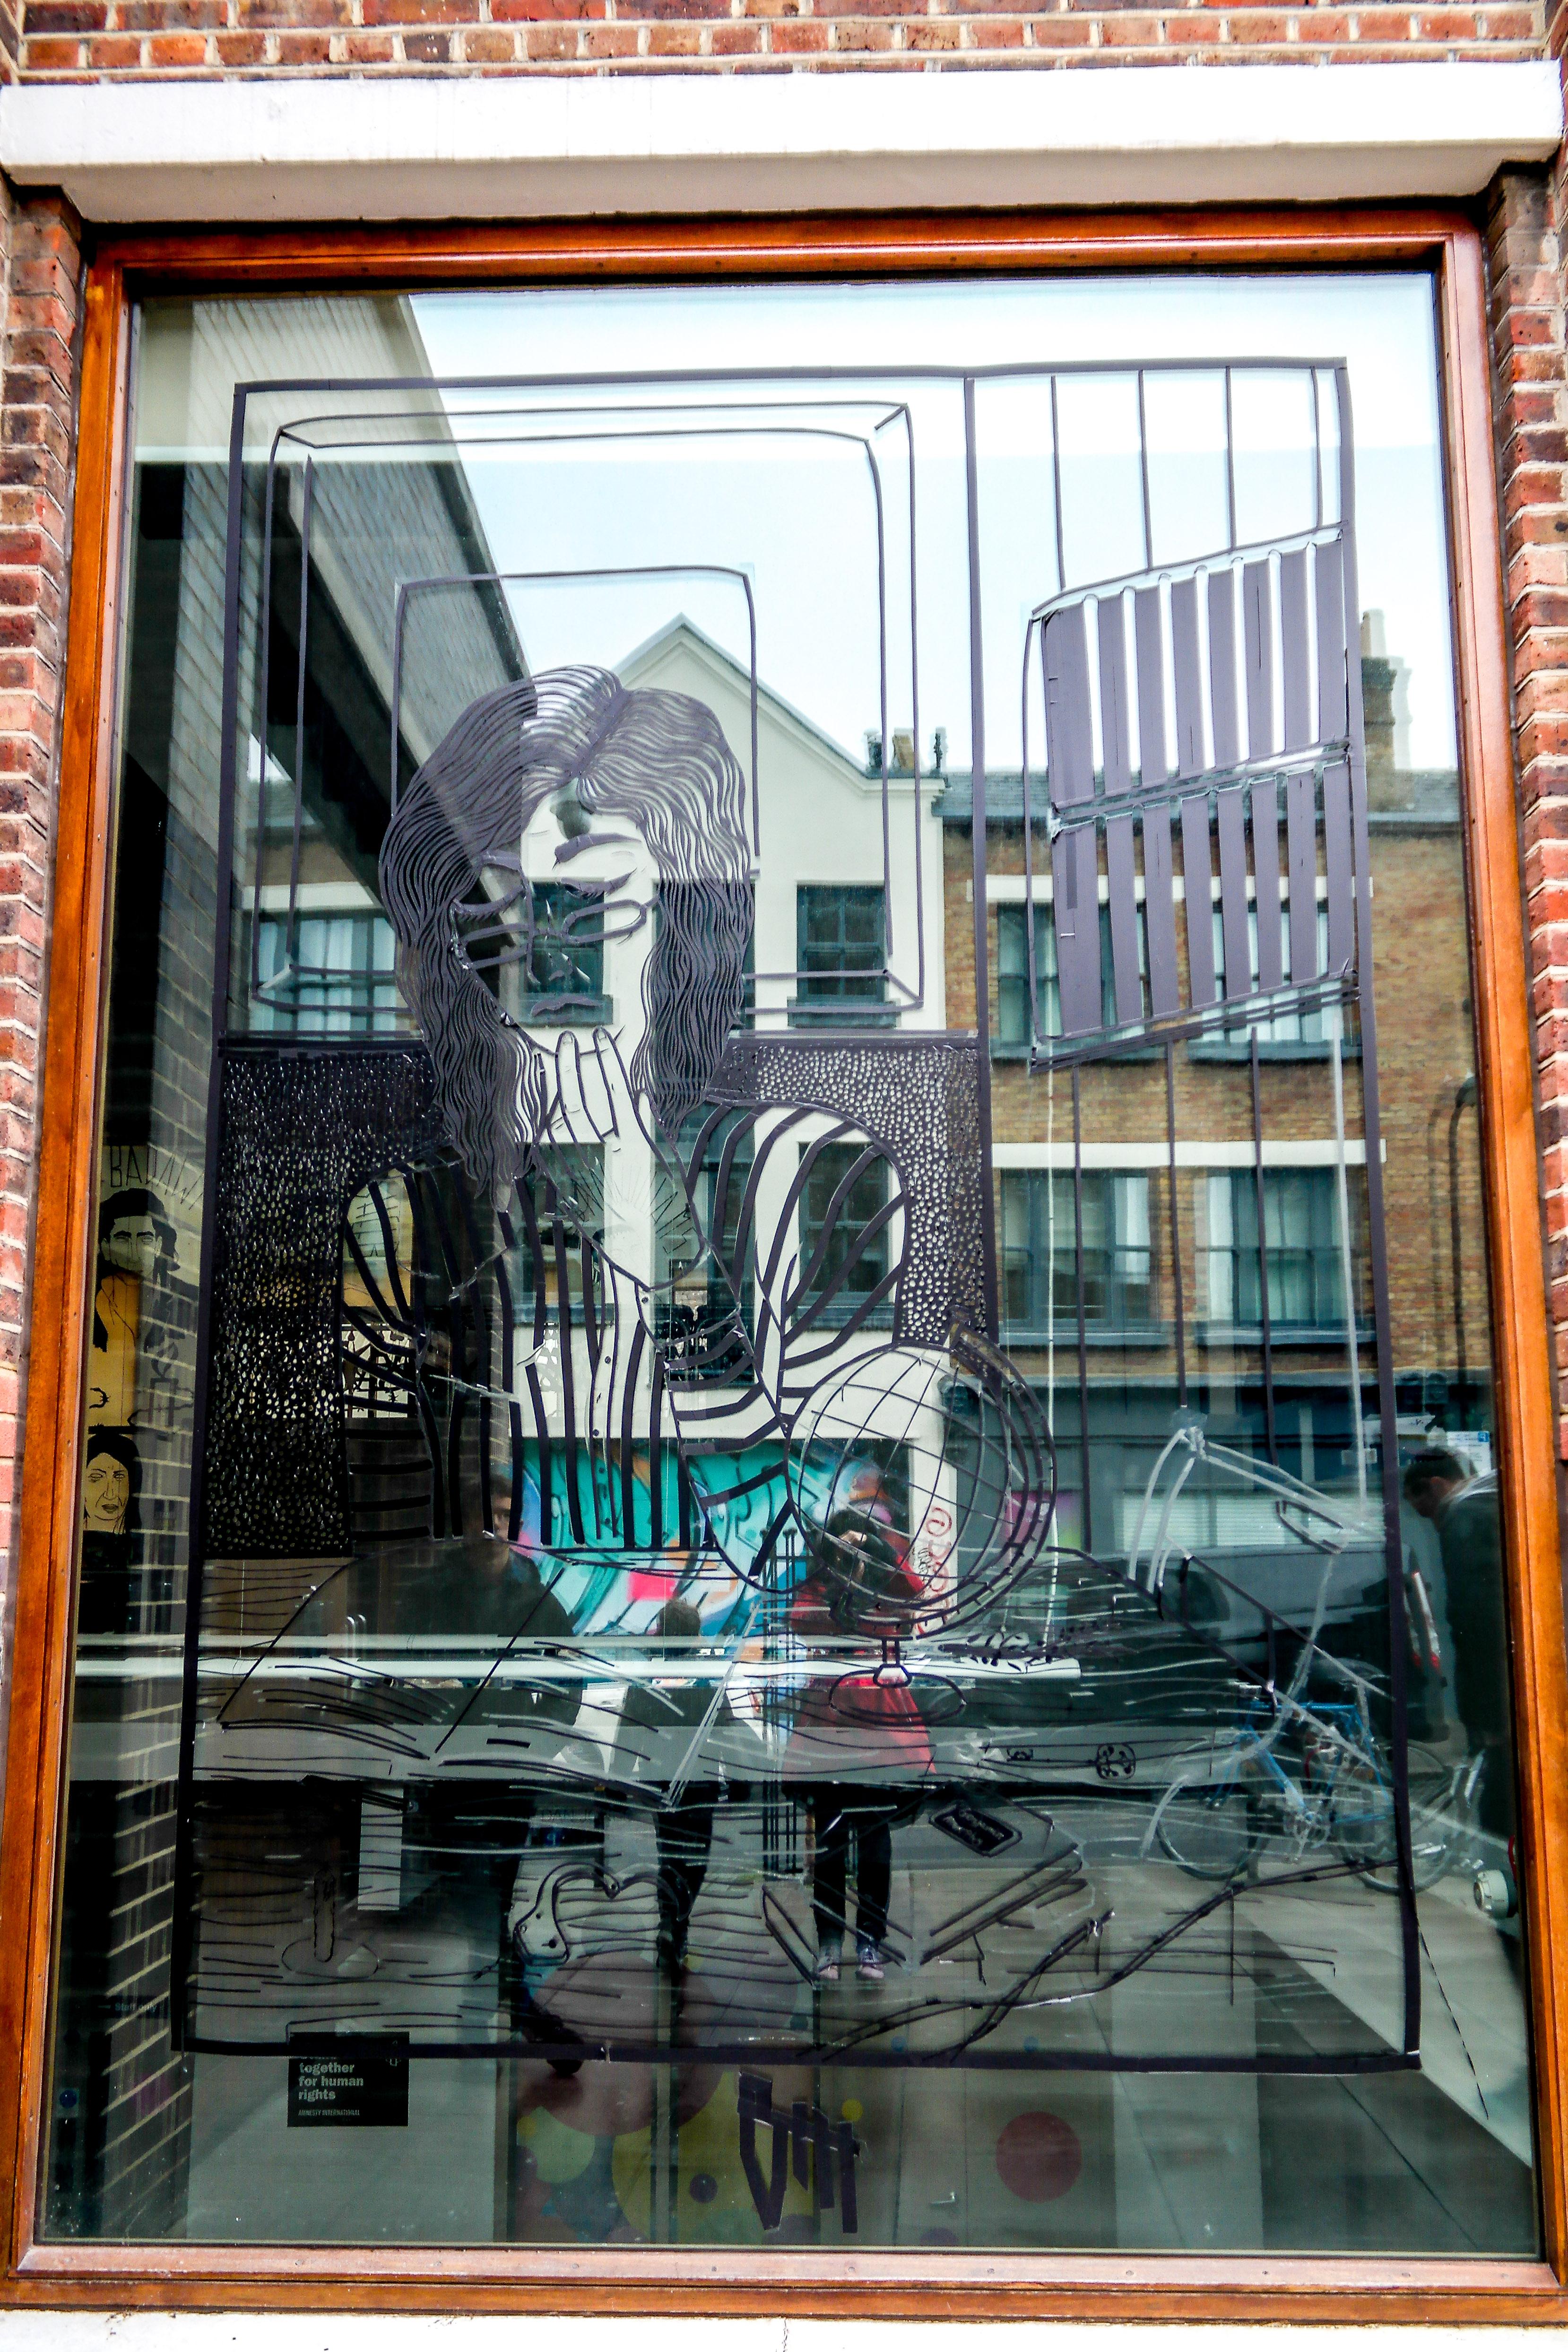 Shoreditch England: Shoreditch Street Art London England United Kingdom